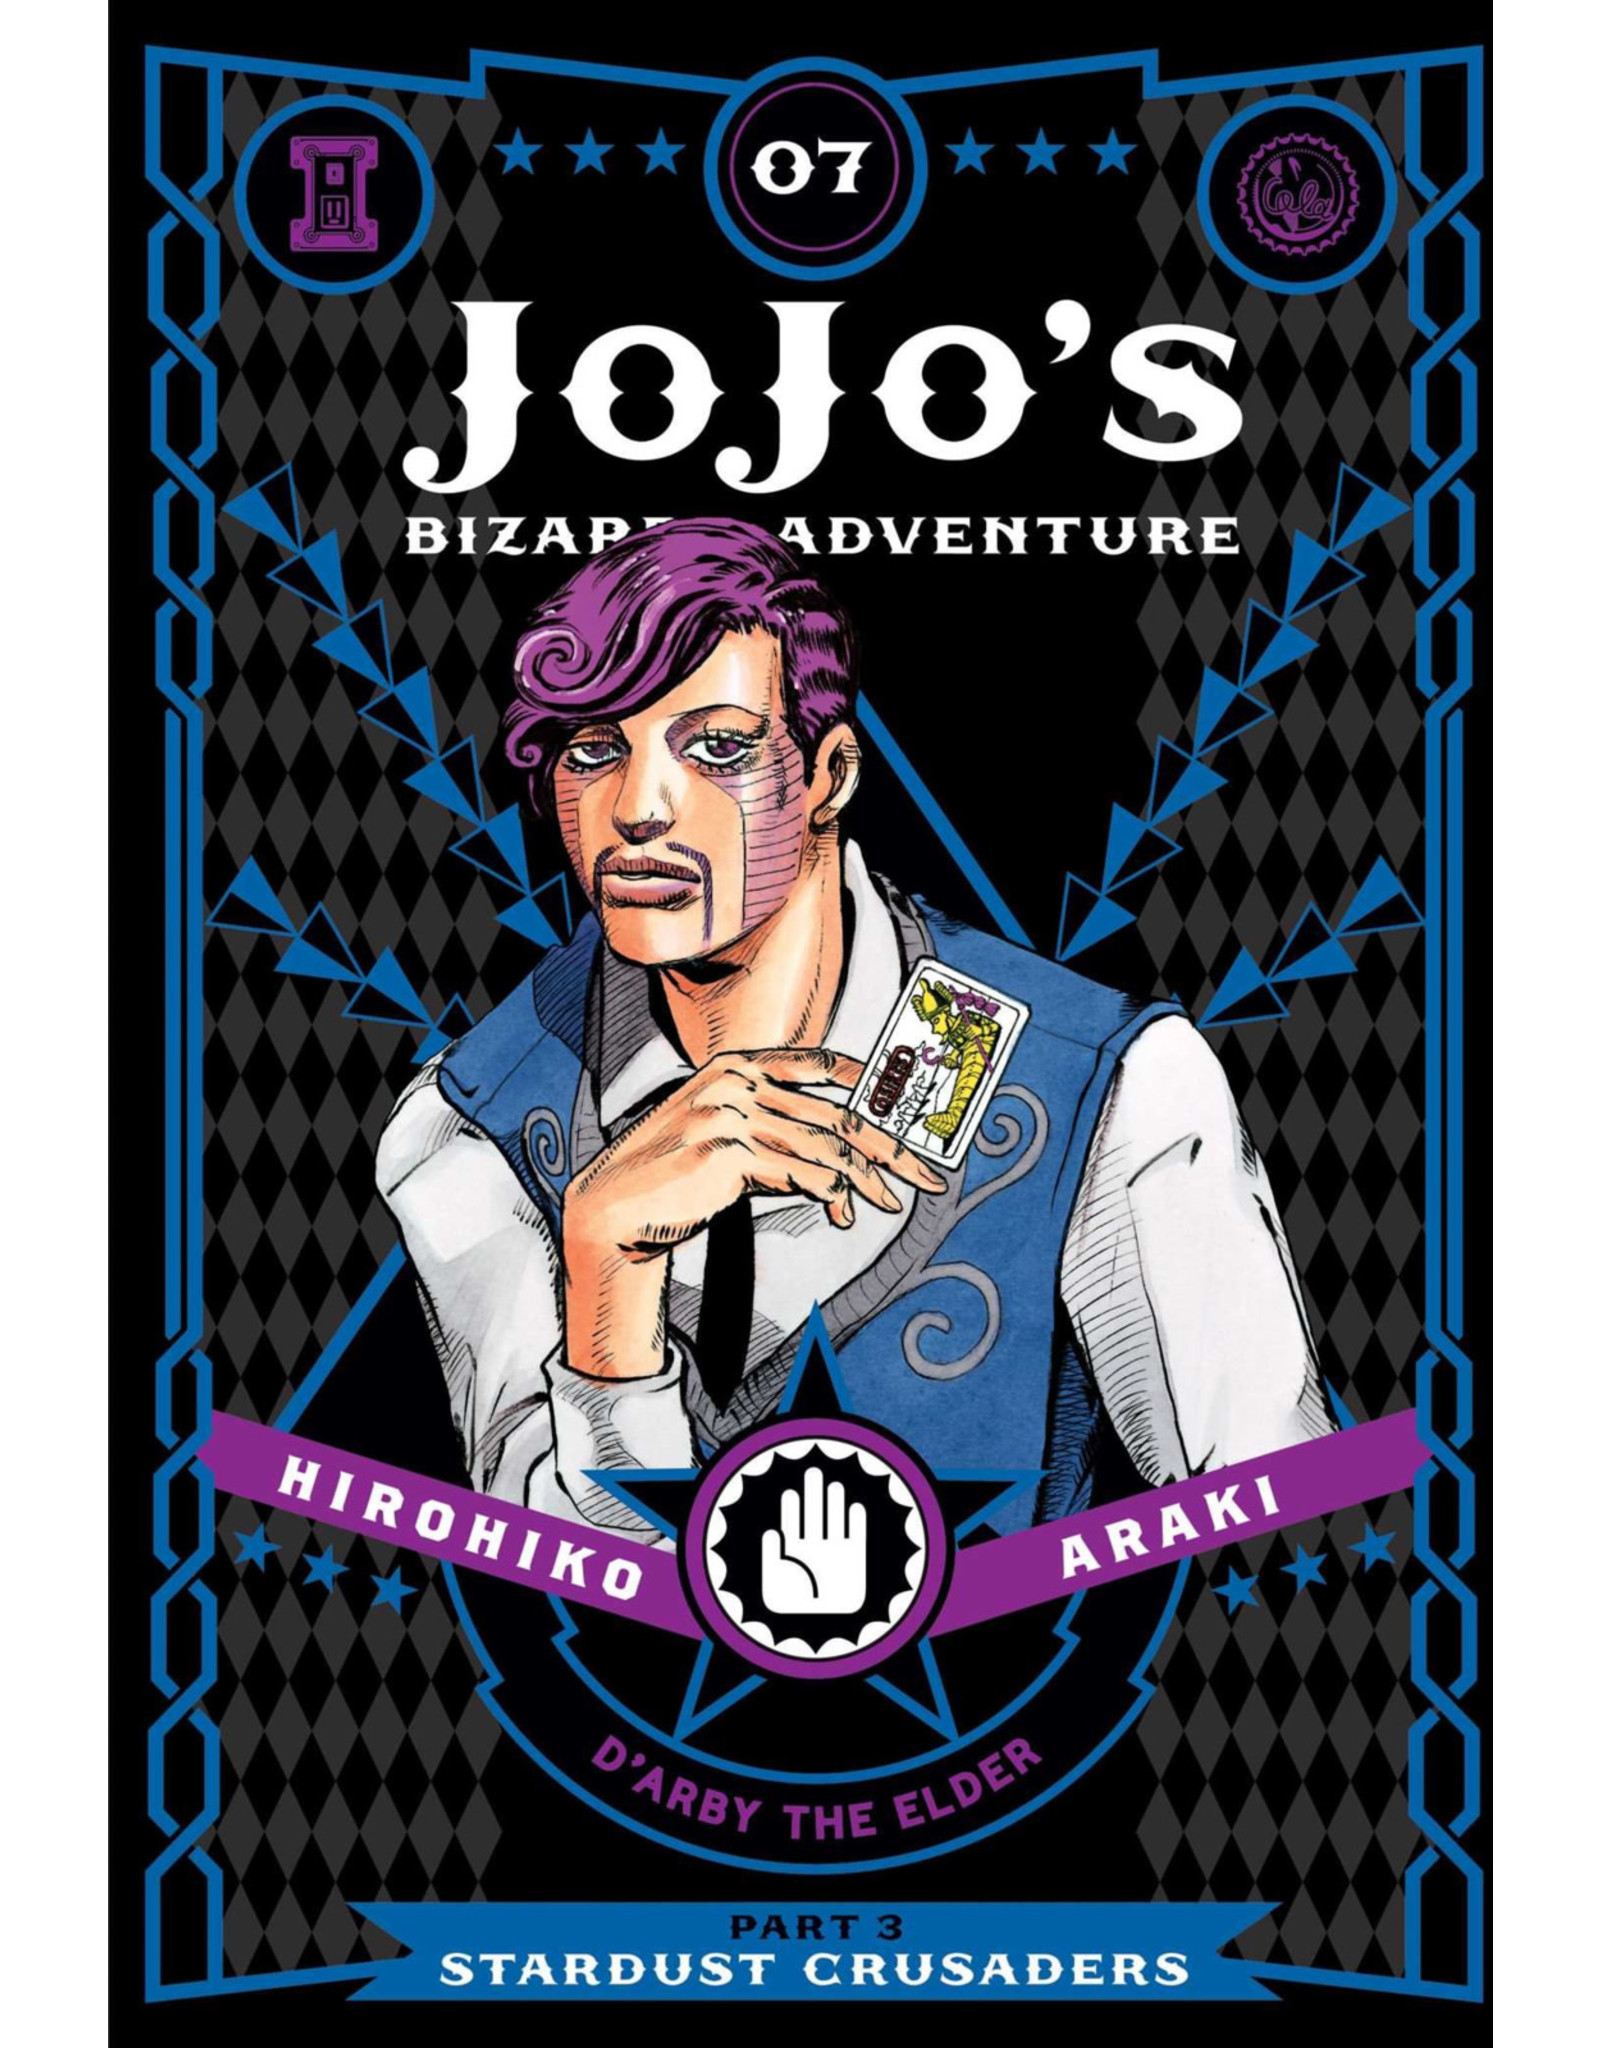 Jojo's Bizarre Adventure - Part 3: Stardust Crusaders - Volume 7 - Hardcover (English Version)